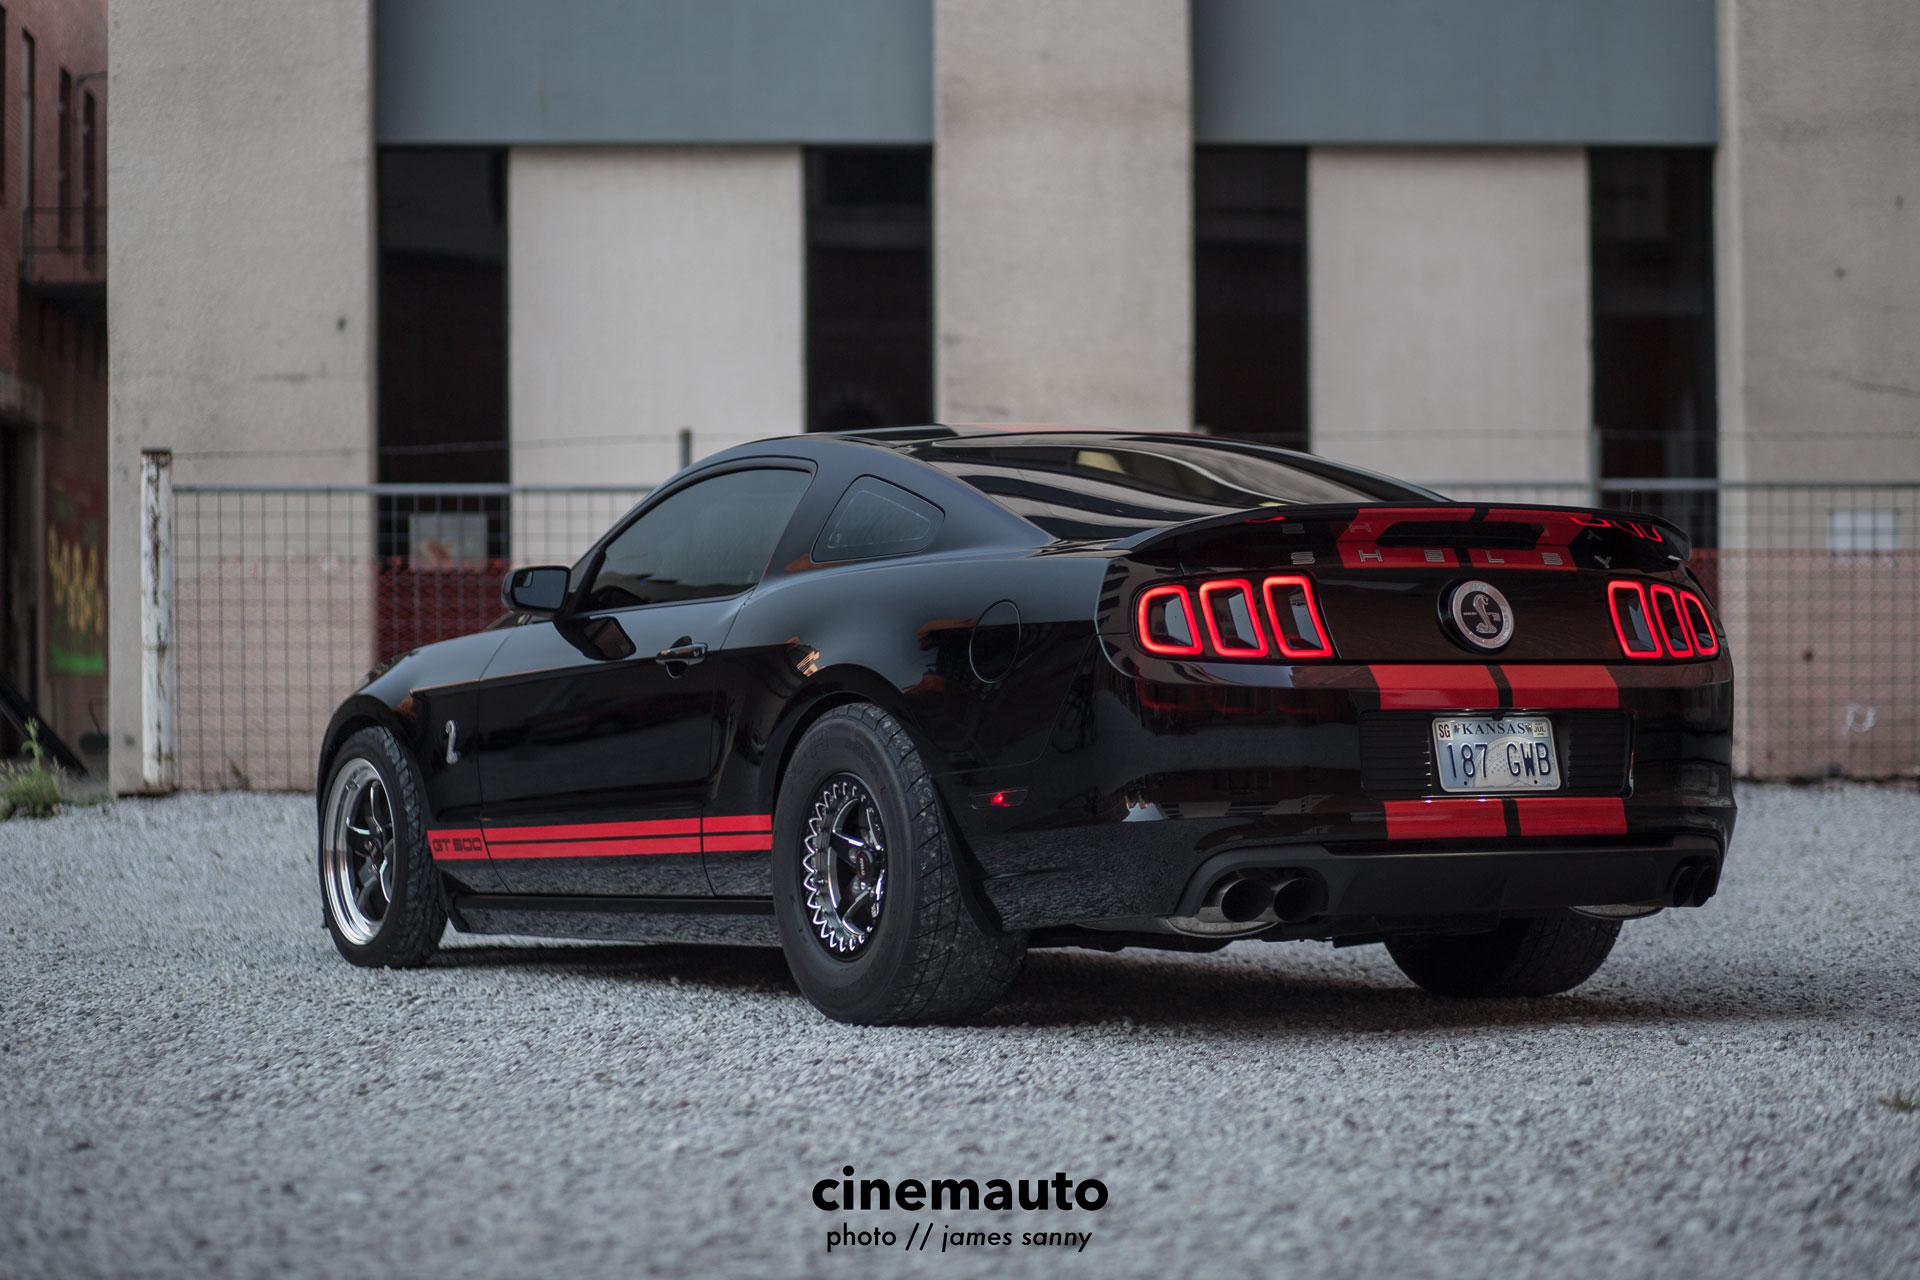 cinemauto-wichita-automotive-photography-cj15a.jpg